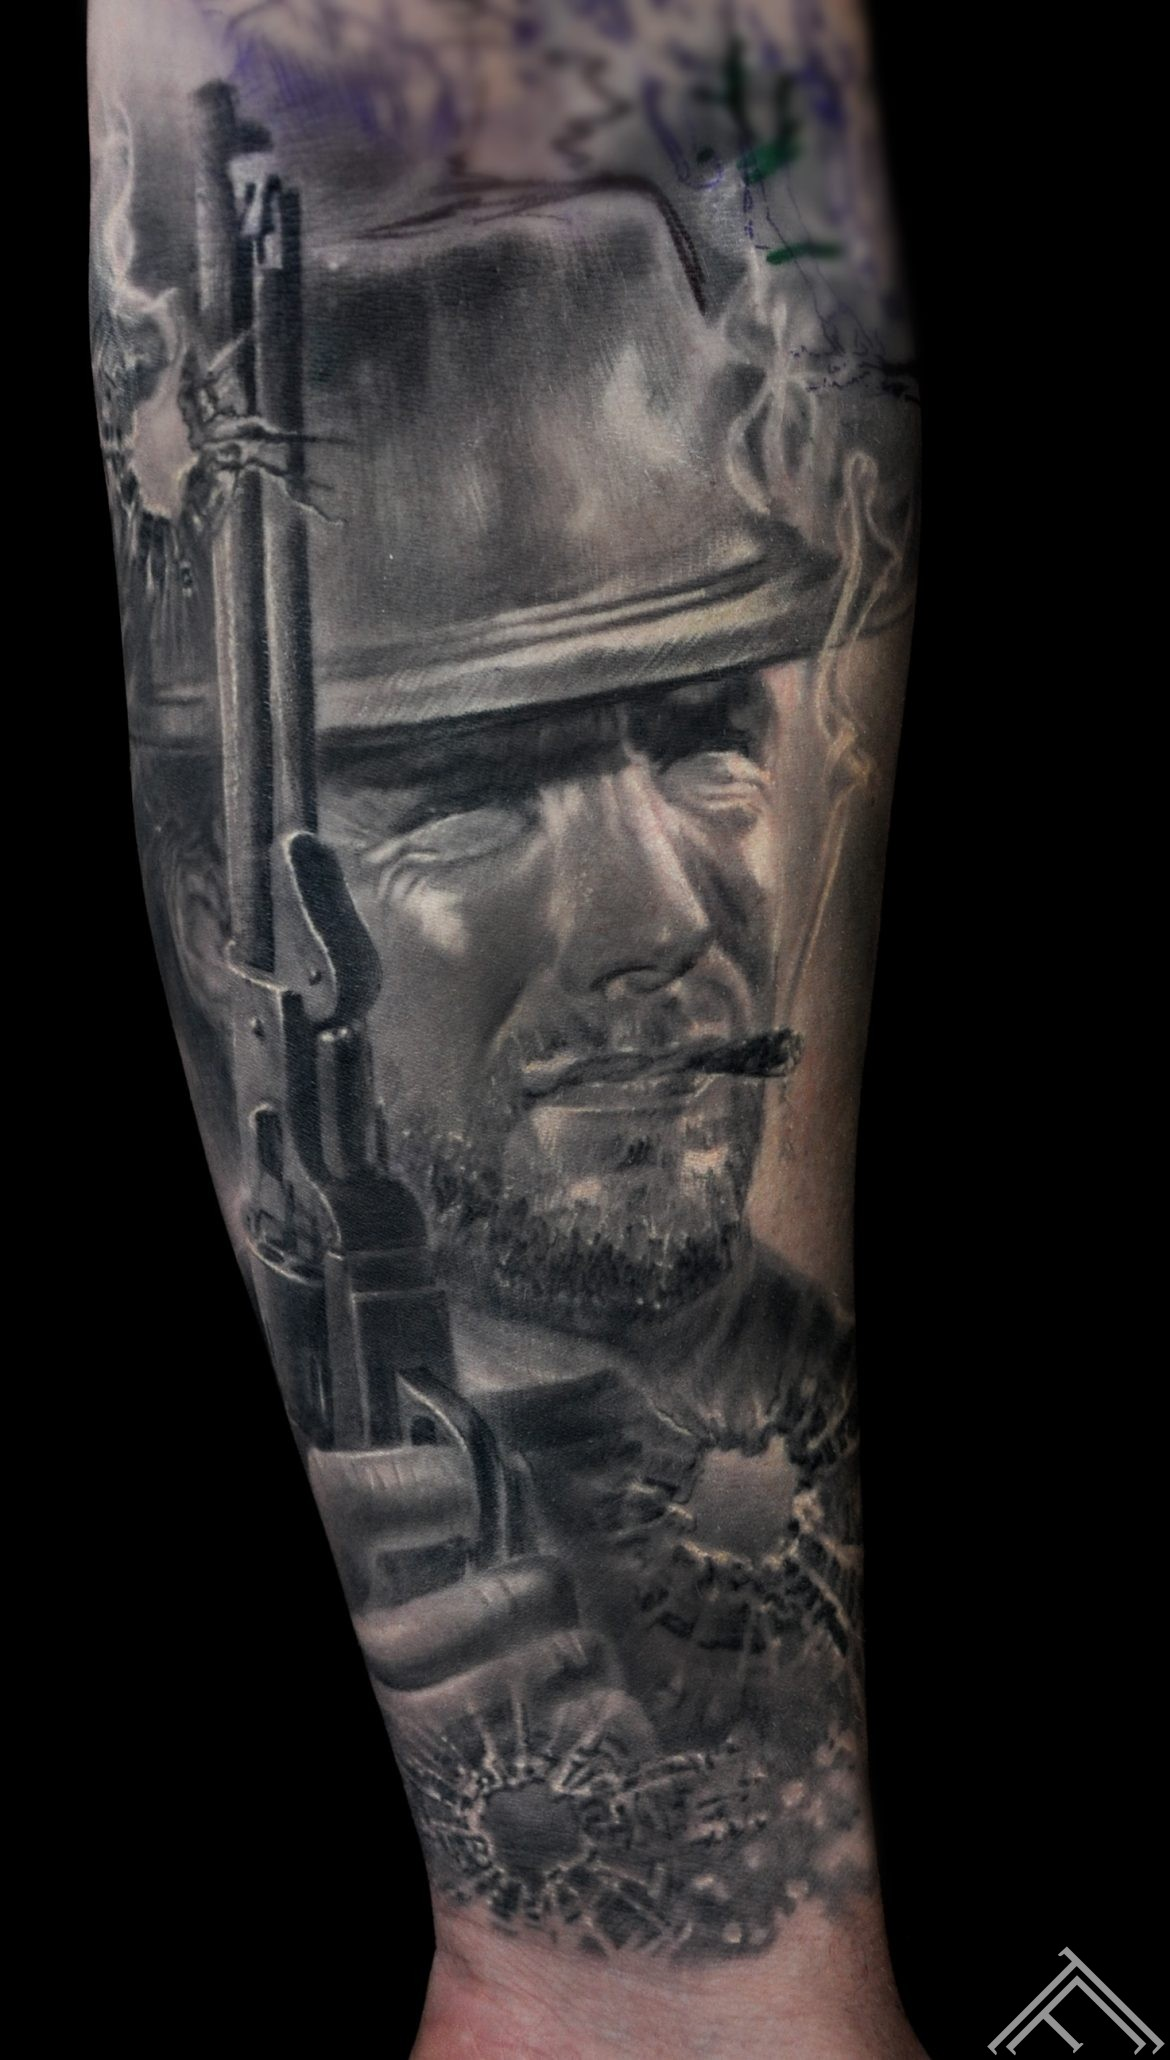 western-wildwest-horse-cowboy-ranch-zirgs-kovbojs-tetovejums-tattoo-tattoofrequency-art-riga-afistfulofdollars-clinteastwood